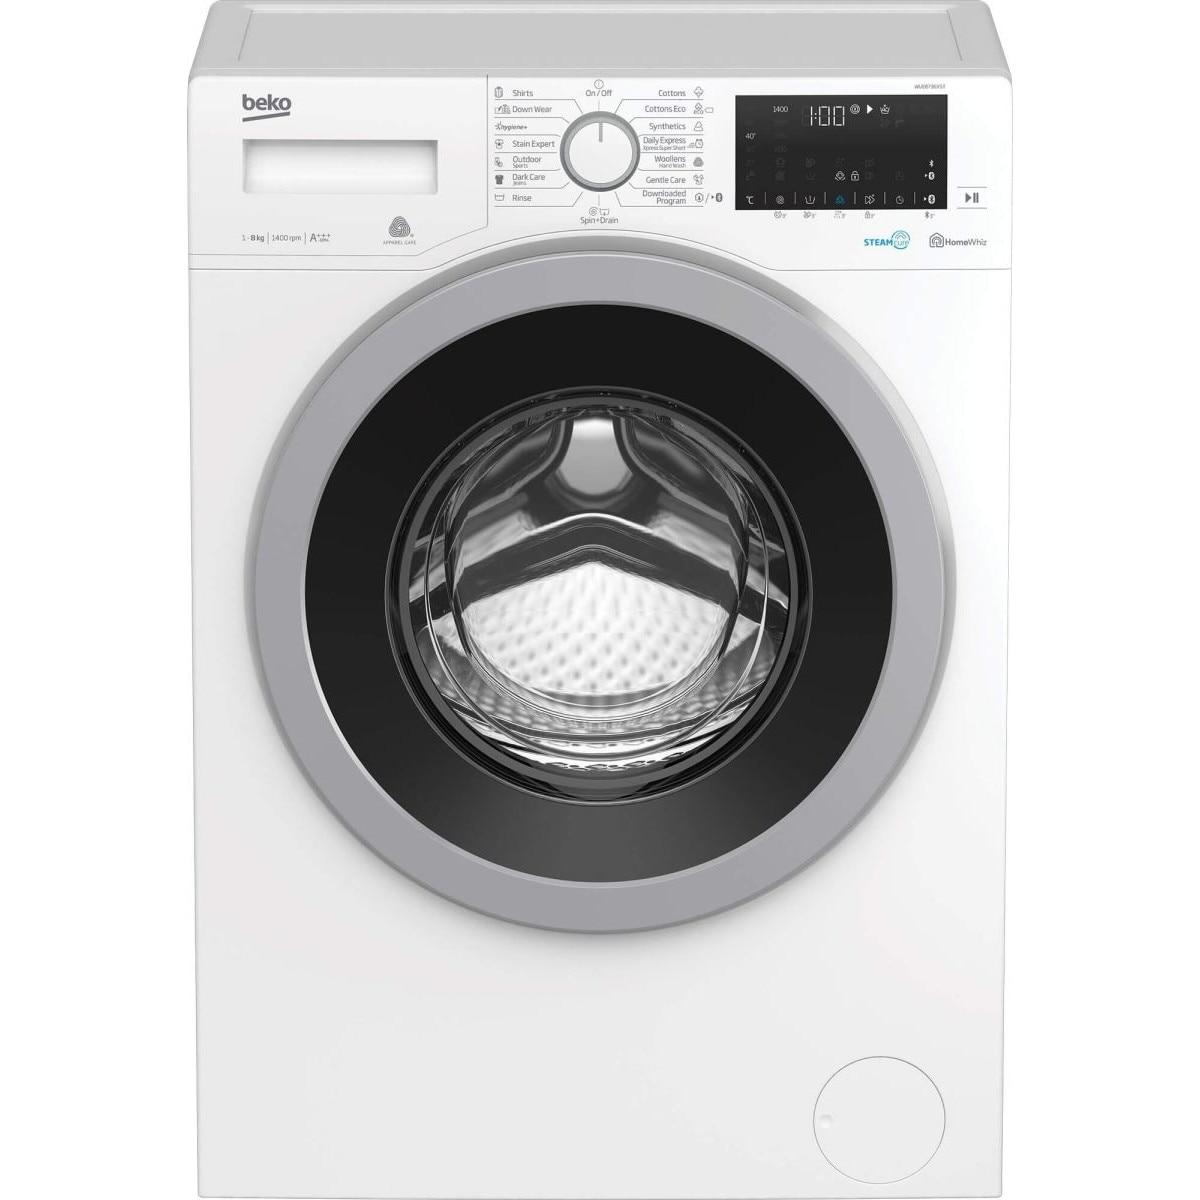 Fotografie Masina de spalat rufe Beko WUE8736XST, 8 kg, Clasa A+++, 1400 RPM, HomeWhiz, Bluetooth, SteamCure, Add Garment, Motor ProSmart Inverter, Alb